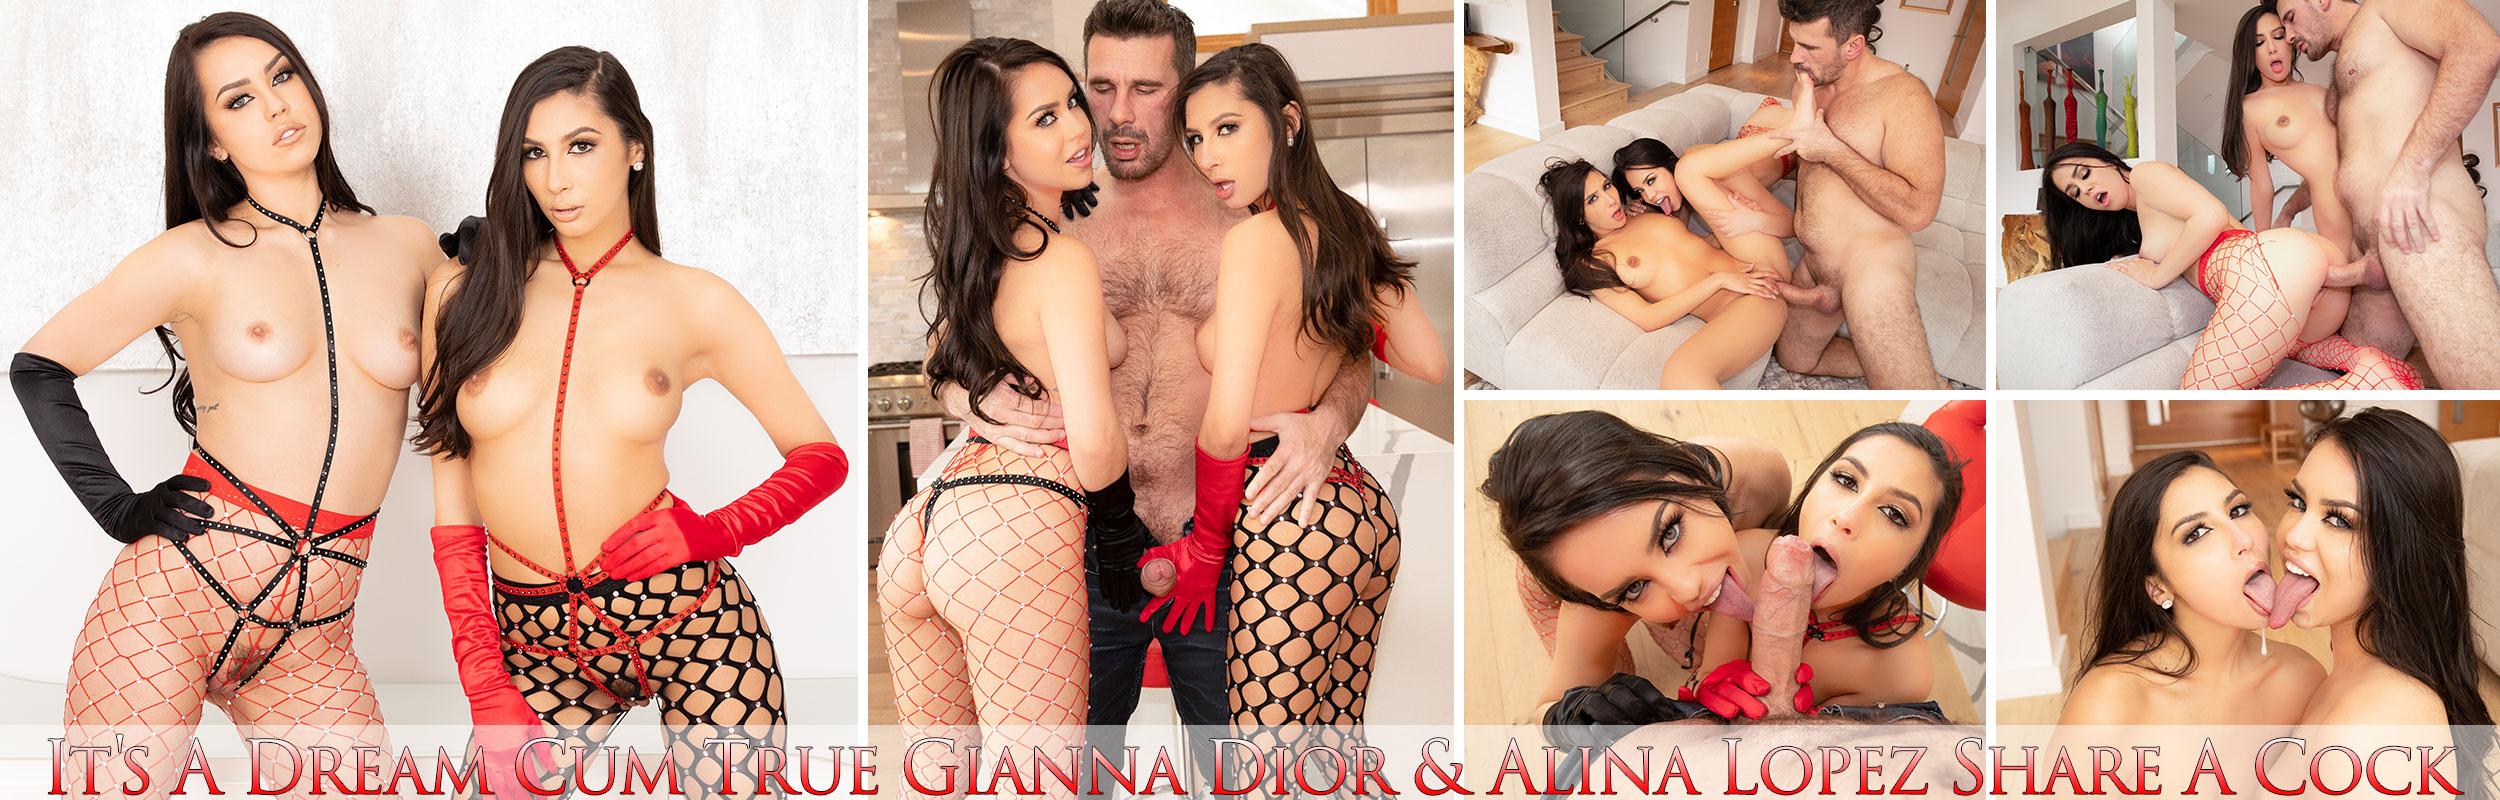 It's A Dream Cum True Gianna Dior & Alina Lopez Share A Cock